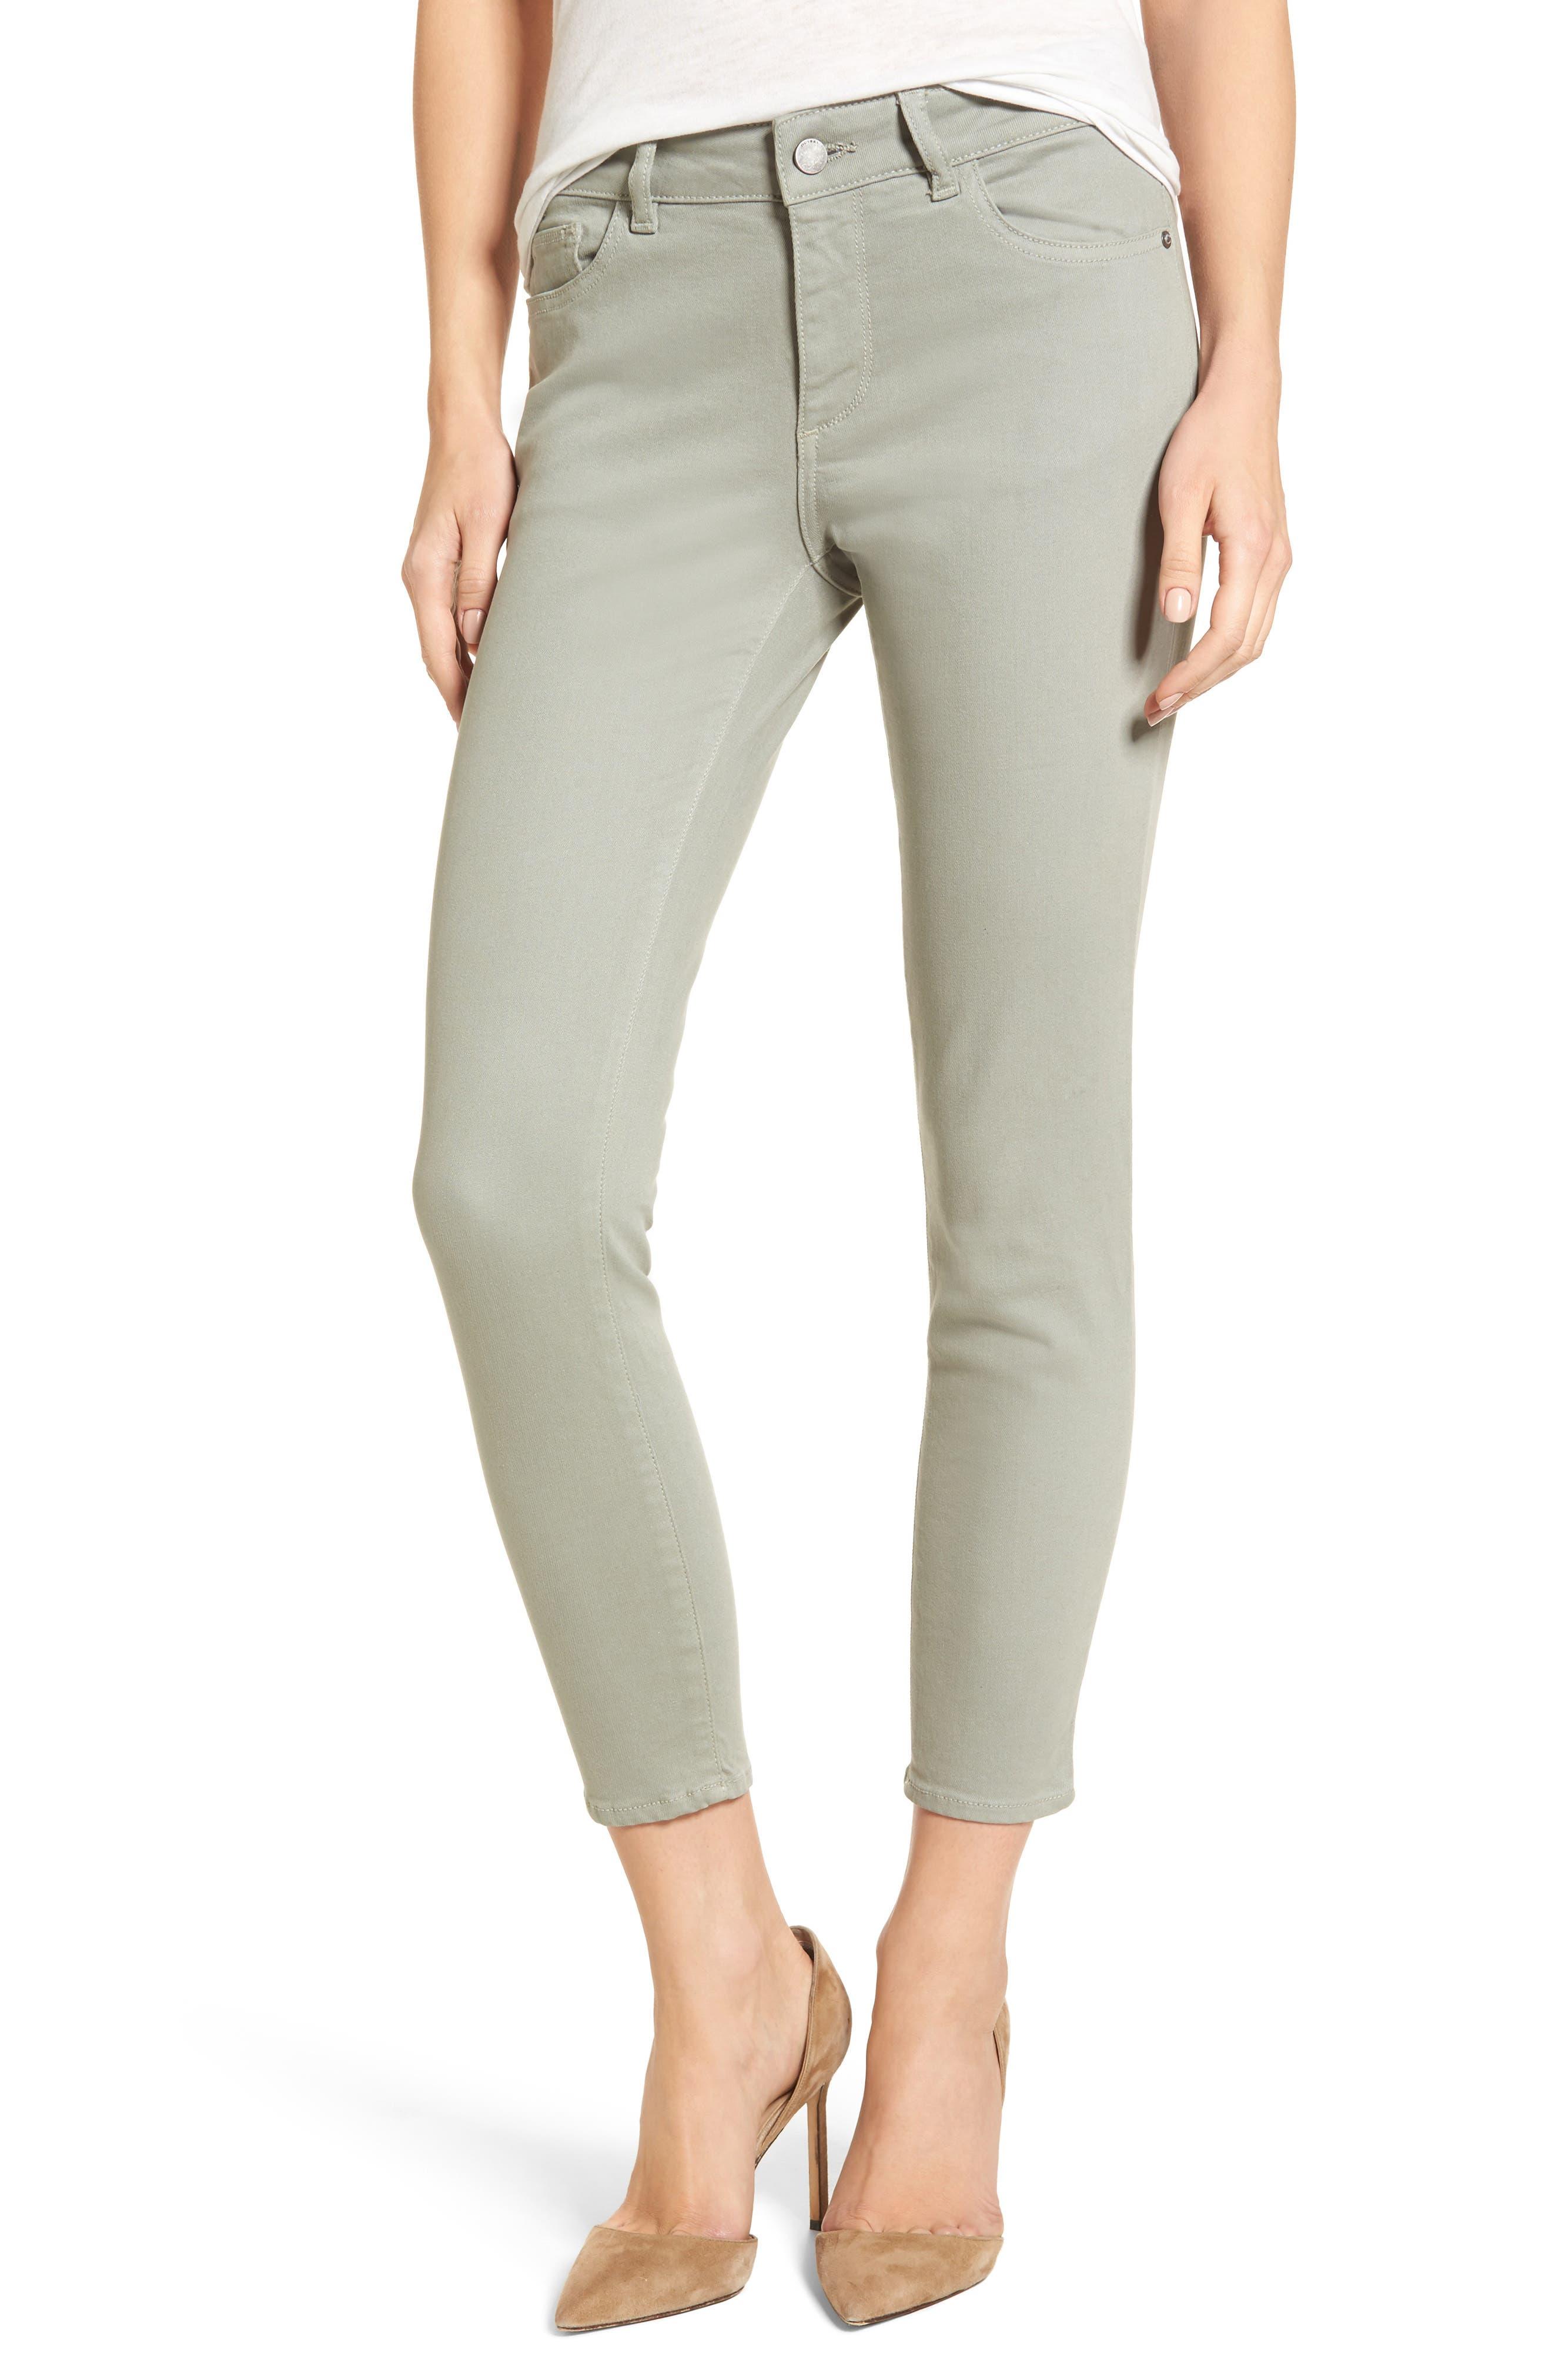 Alternate Image 1 Selected - DL1961 Florence Instasculpt Crop Skinny Jeans (Grove)